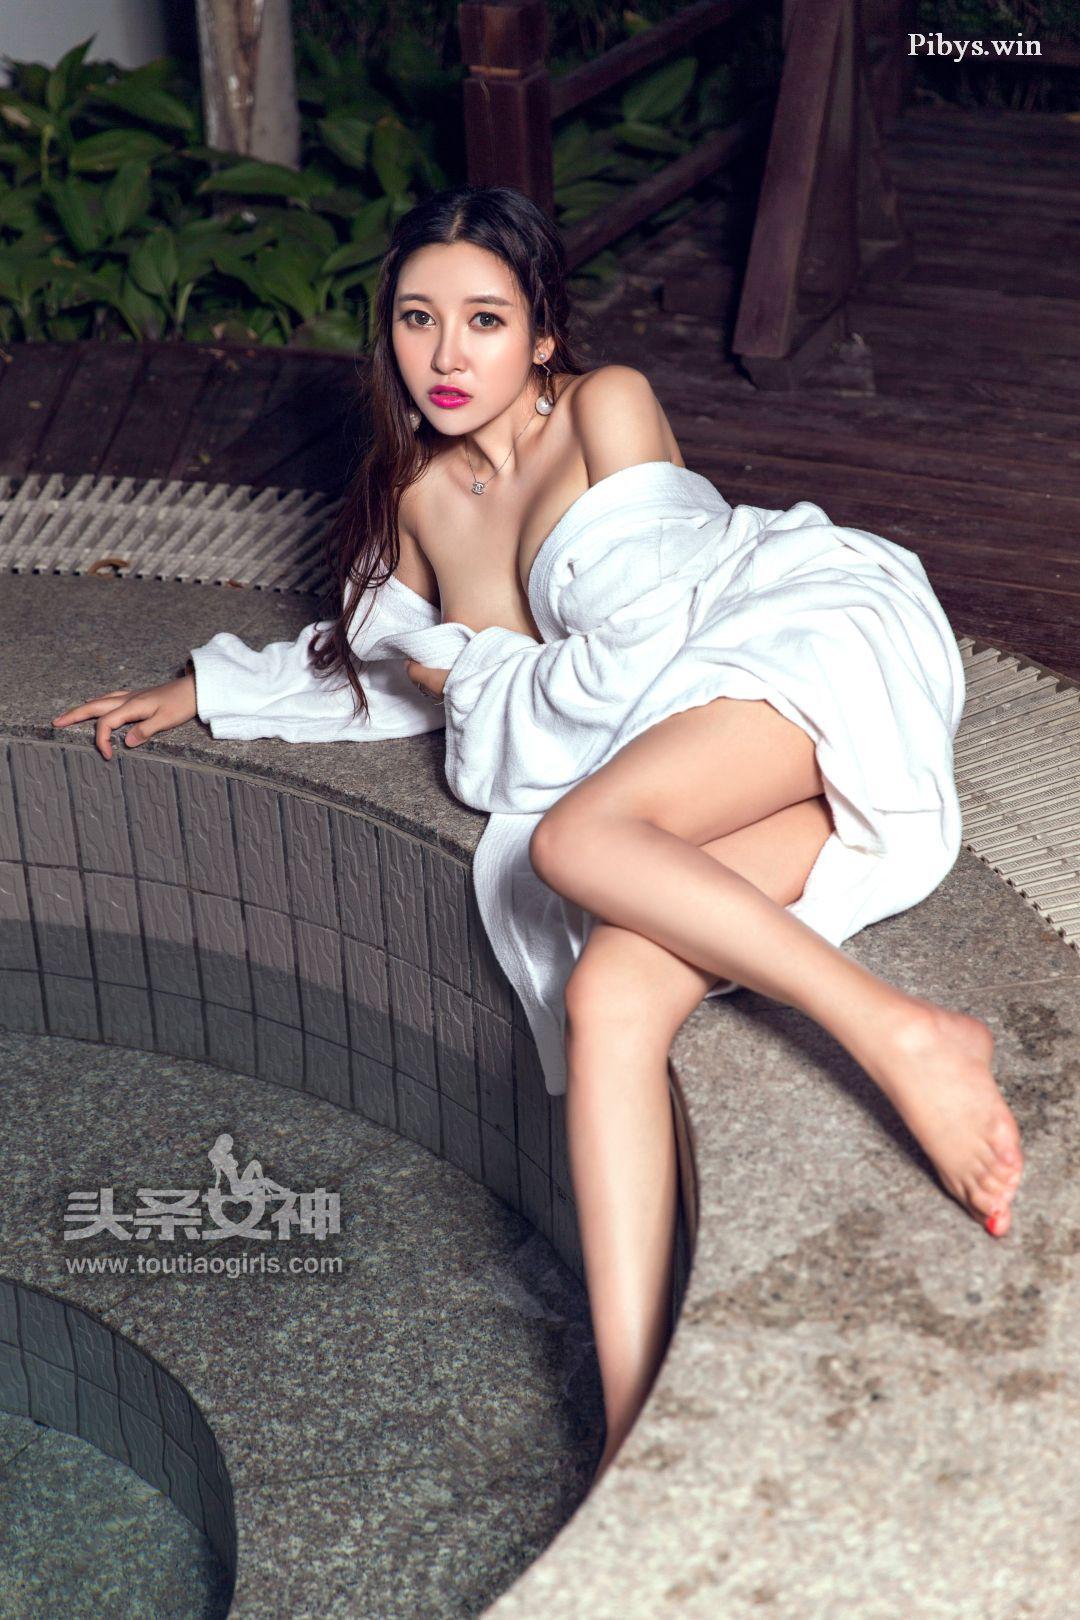 Goddes No.422 - Li Zi Xi (李梓熙) - Pibys